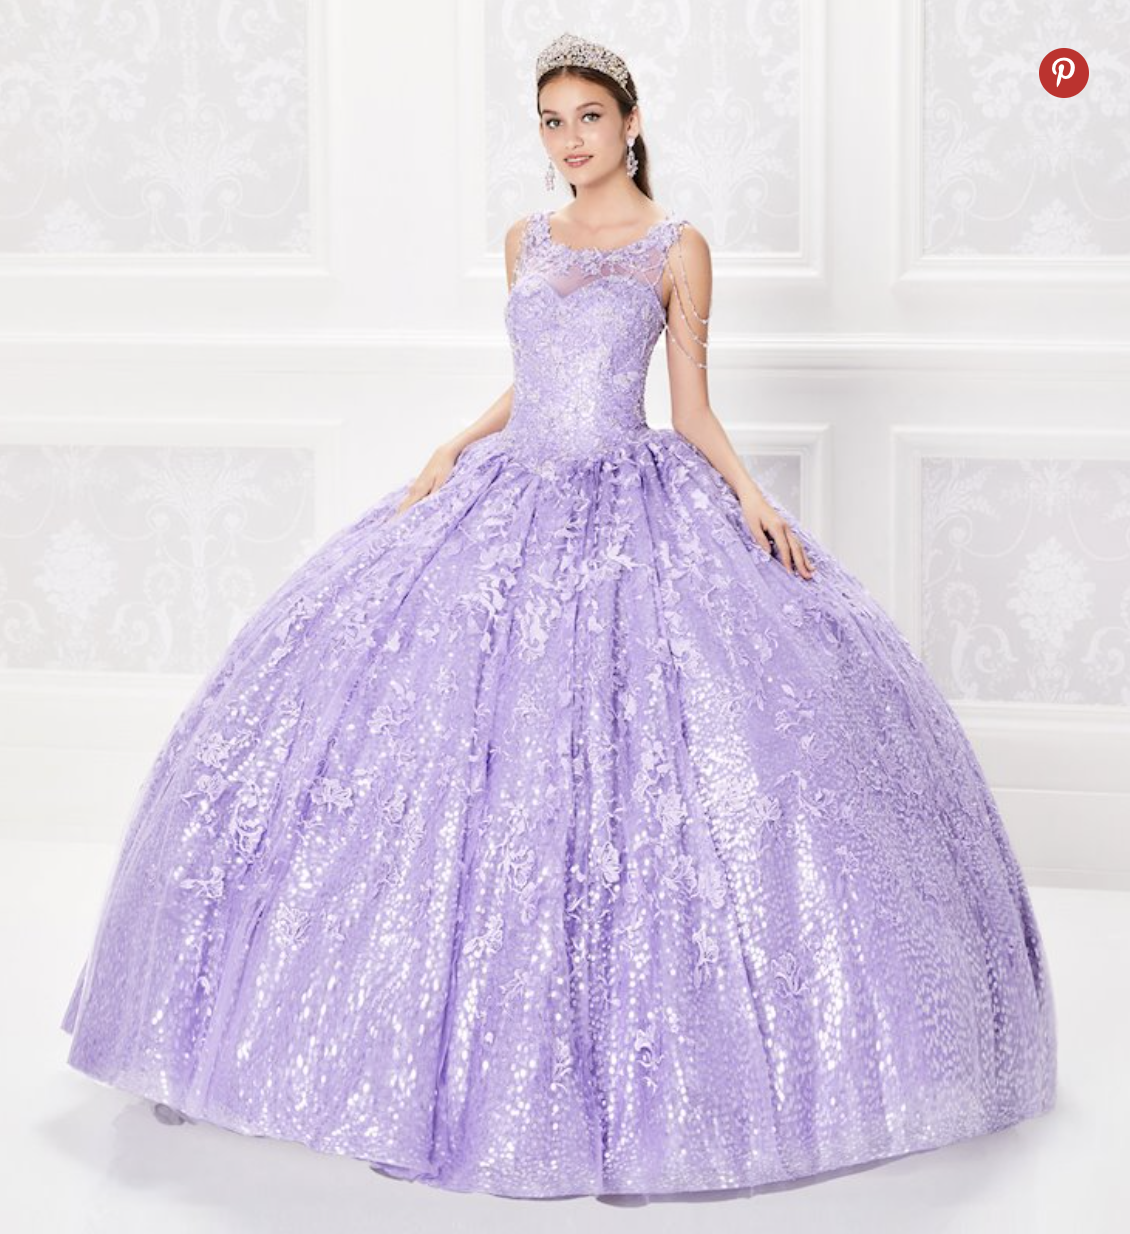 Princesa By Ariana Vara PR21963